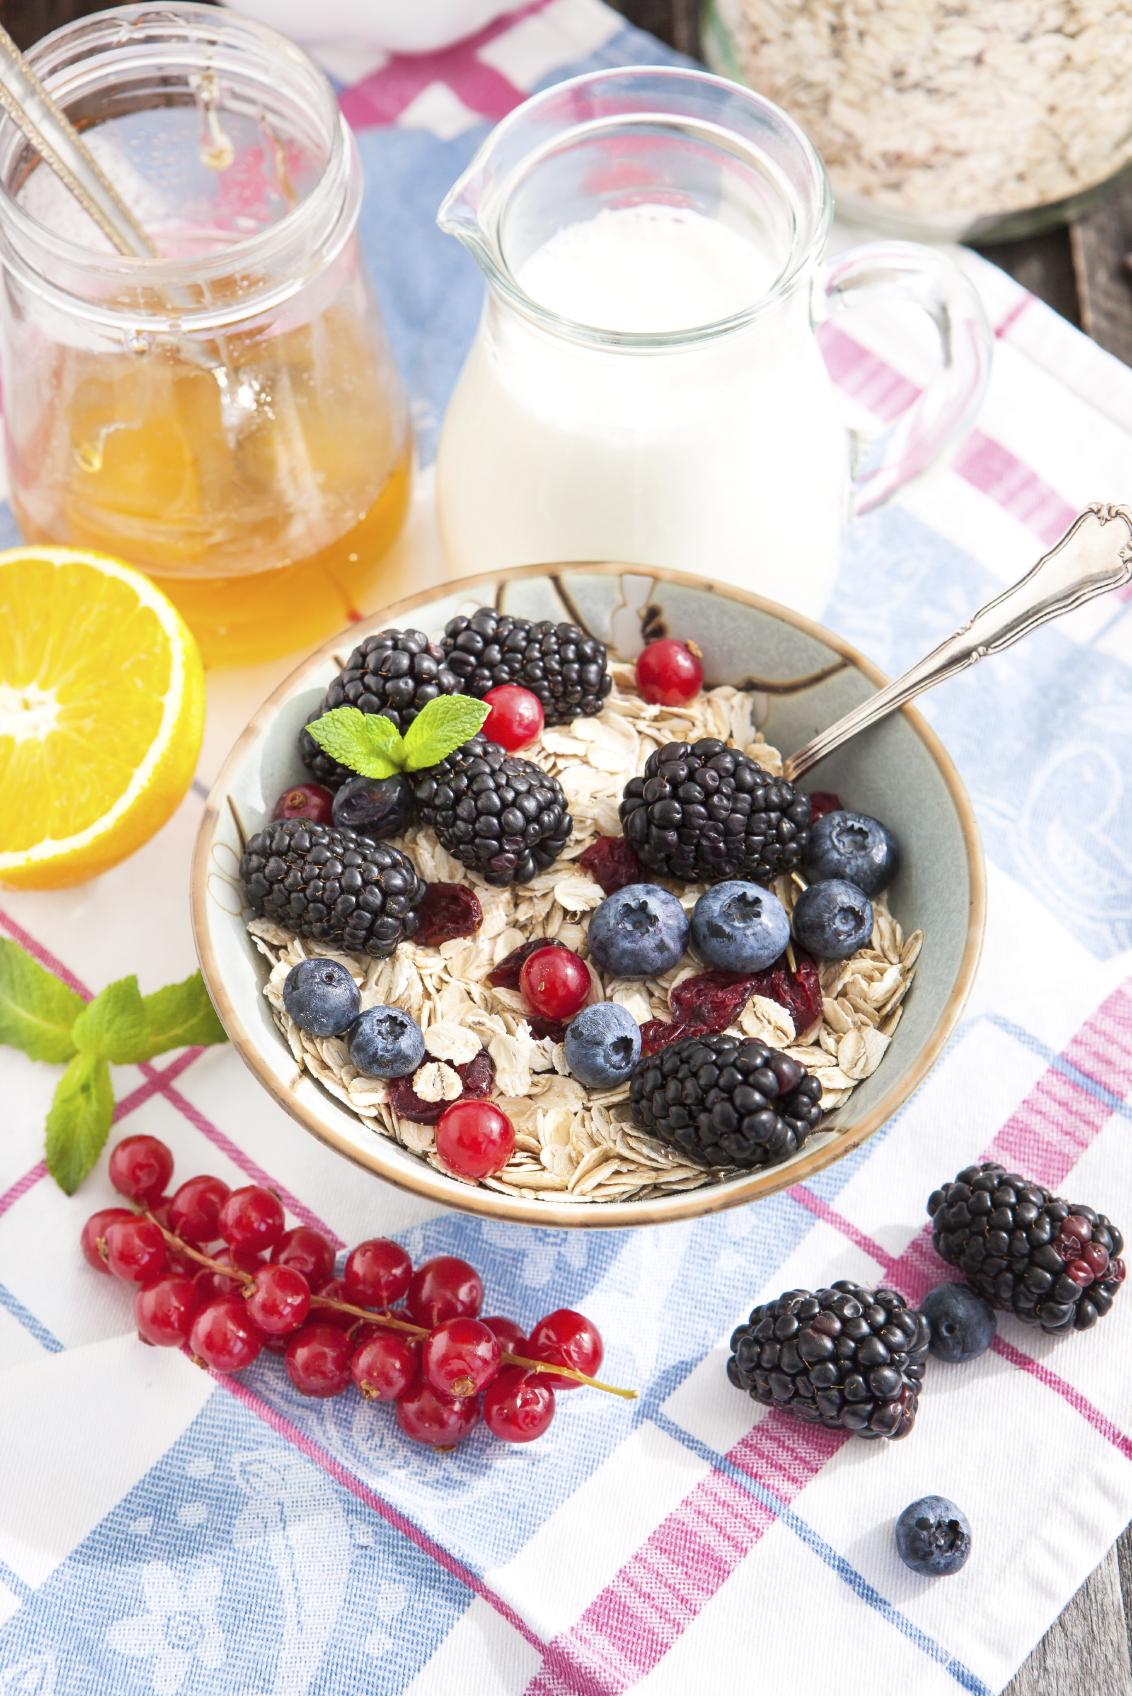 Recipe: Orange cranberry oatmeal